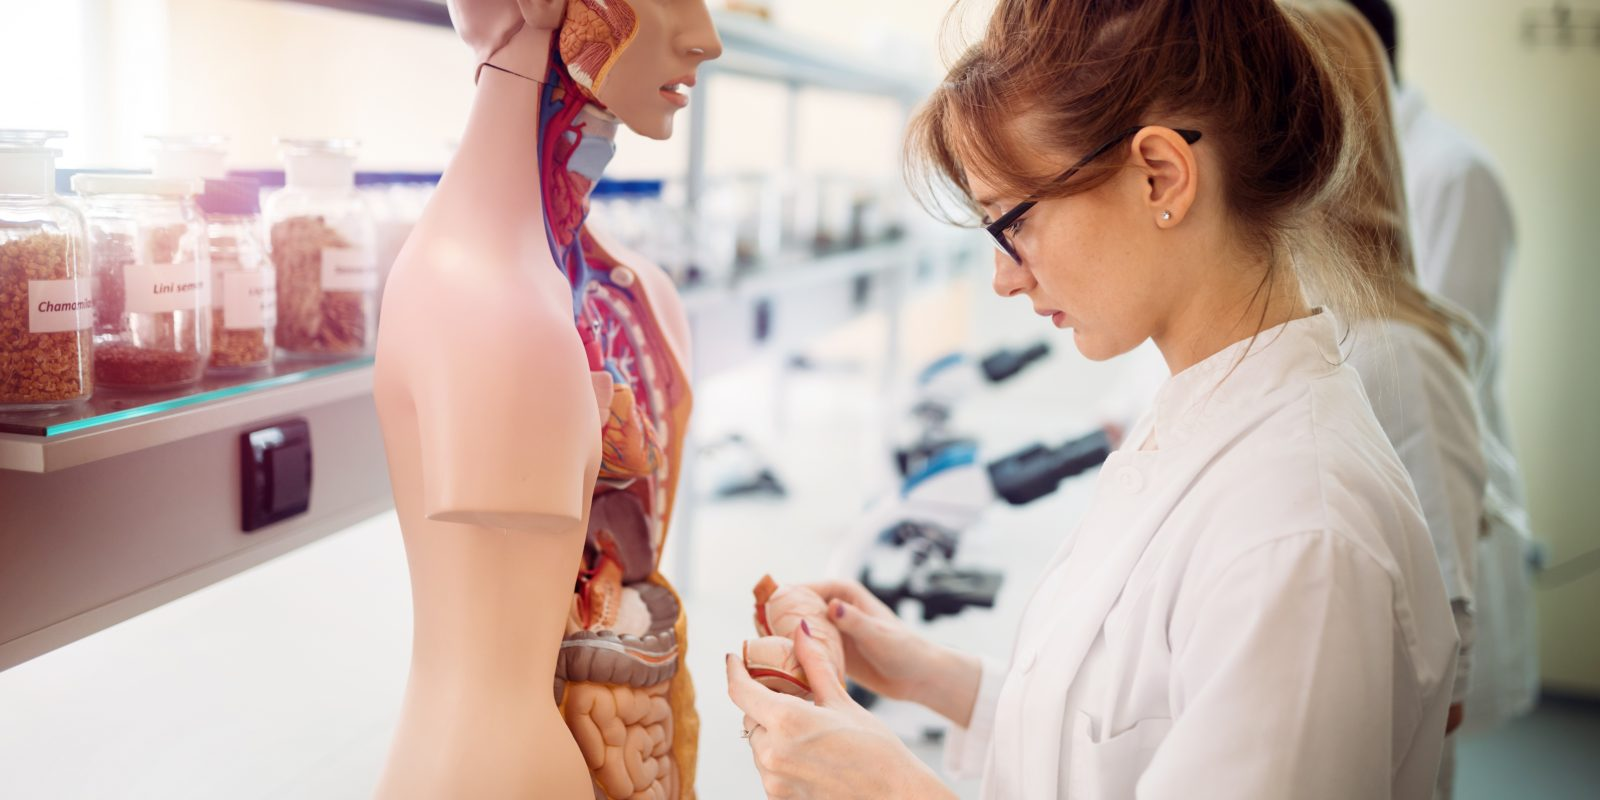 Lady studying the anatomy